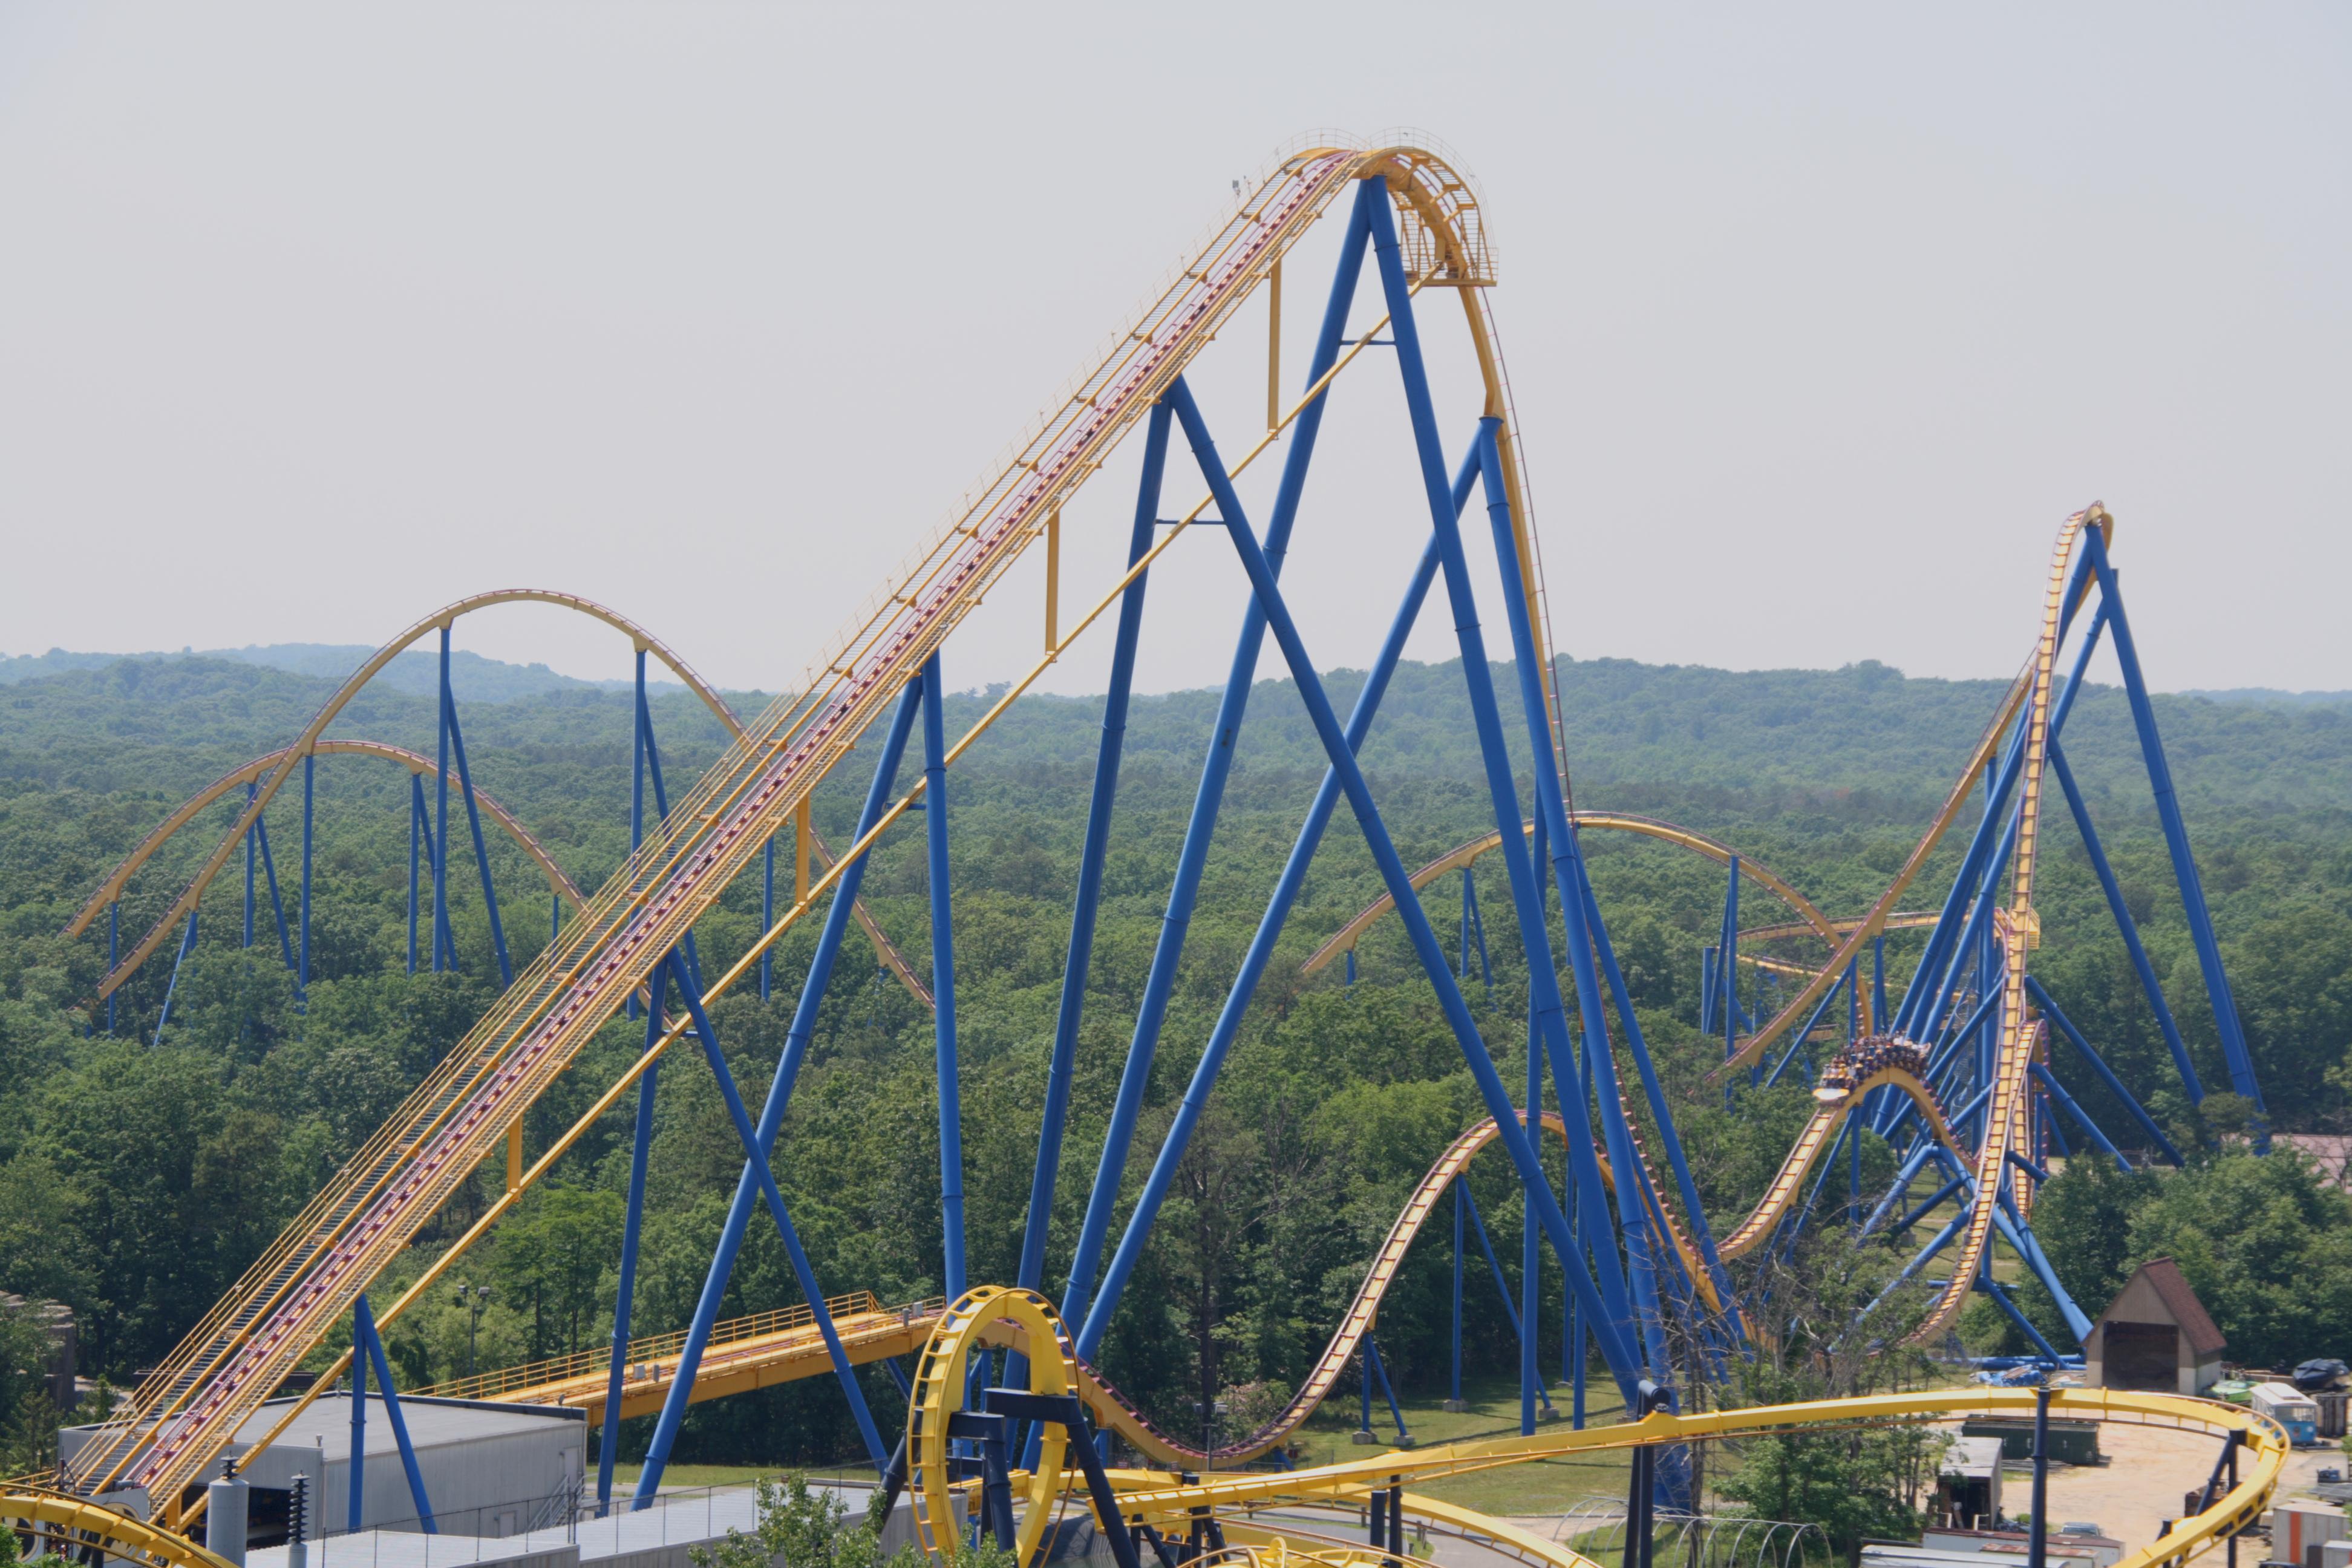 Nitro_coaster.jpg